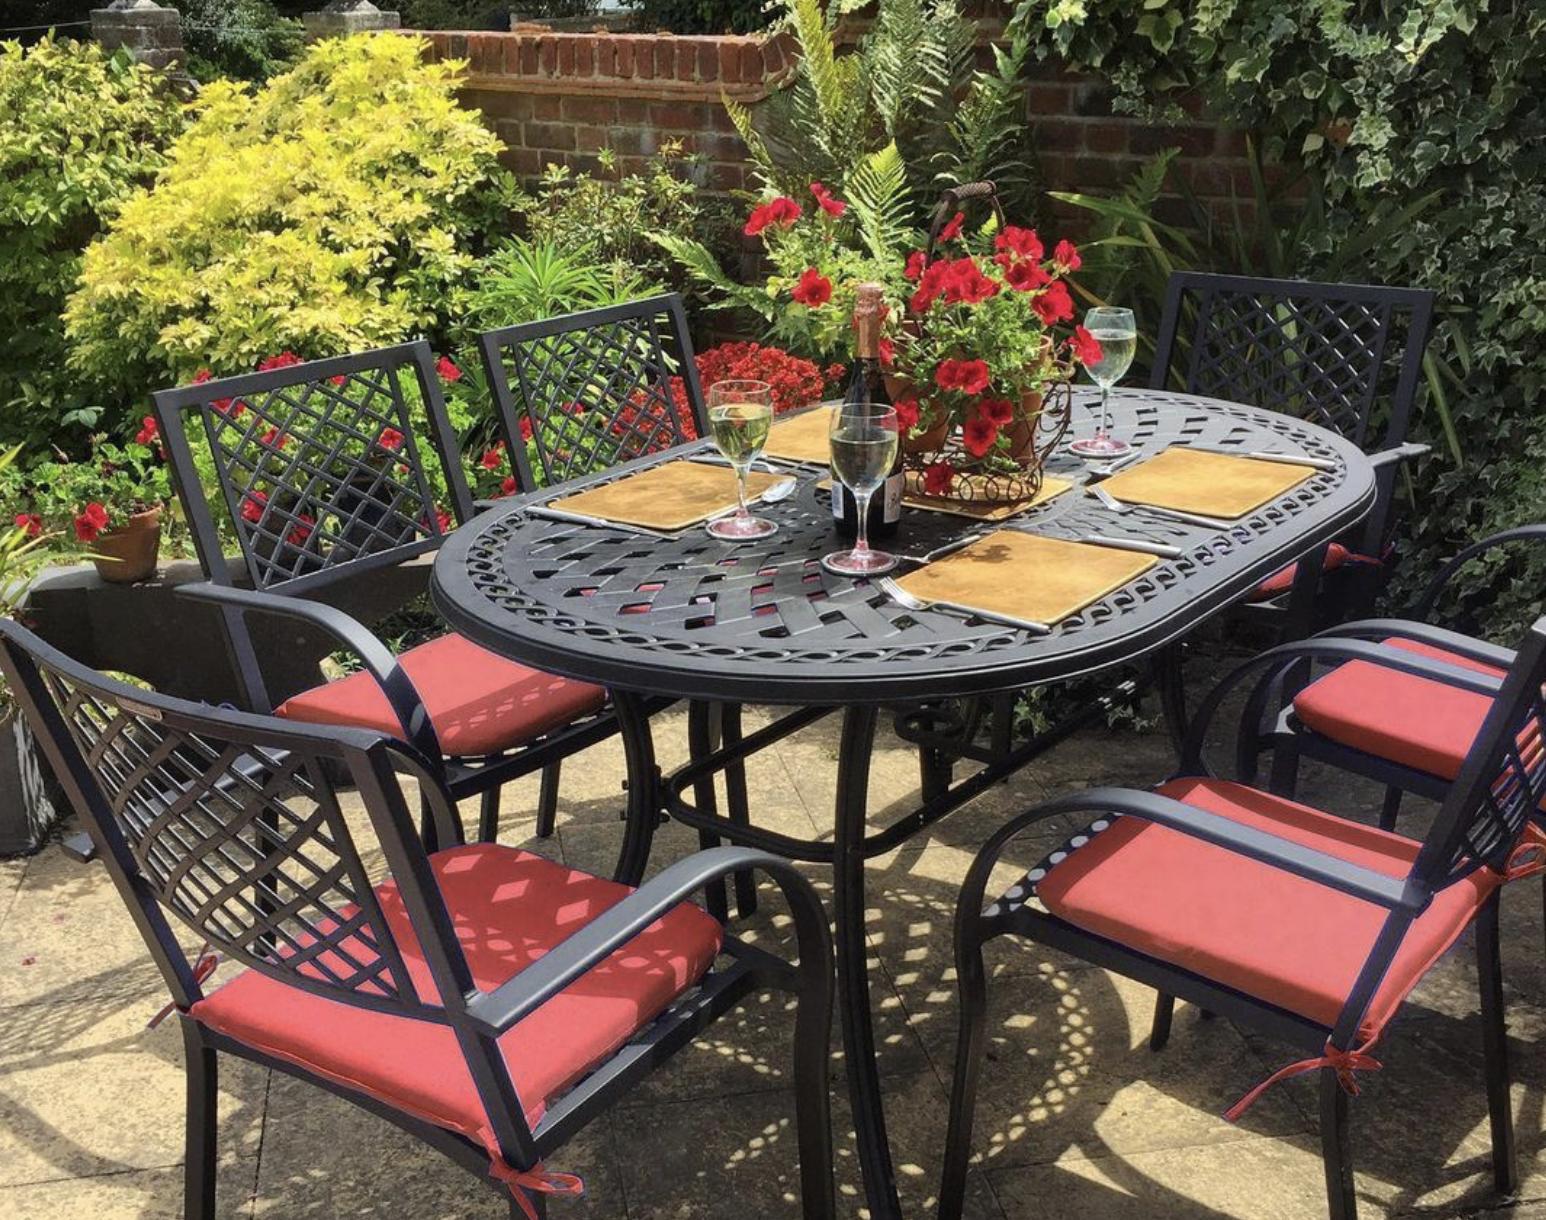 Flowers will always make your garden table pop